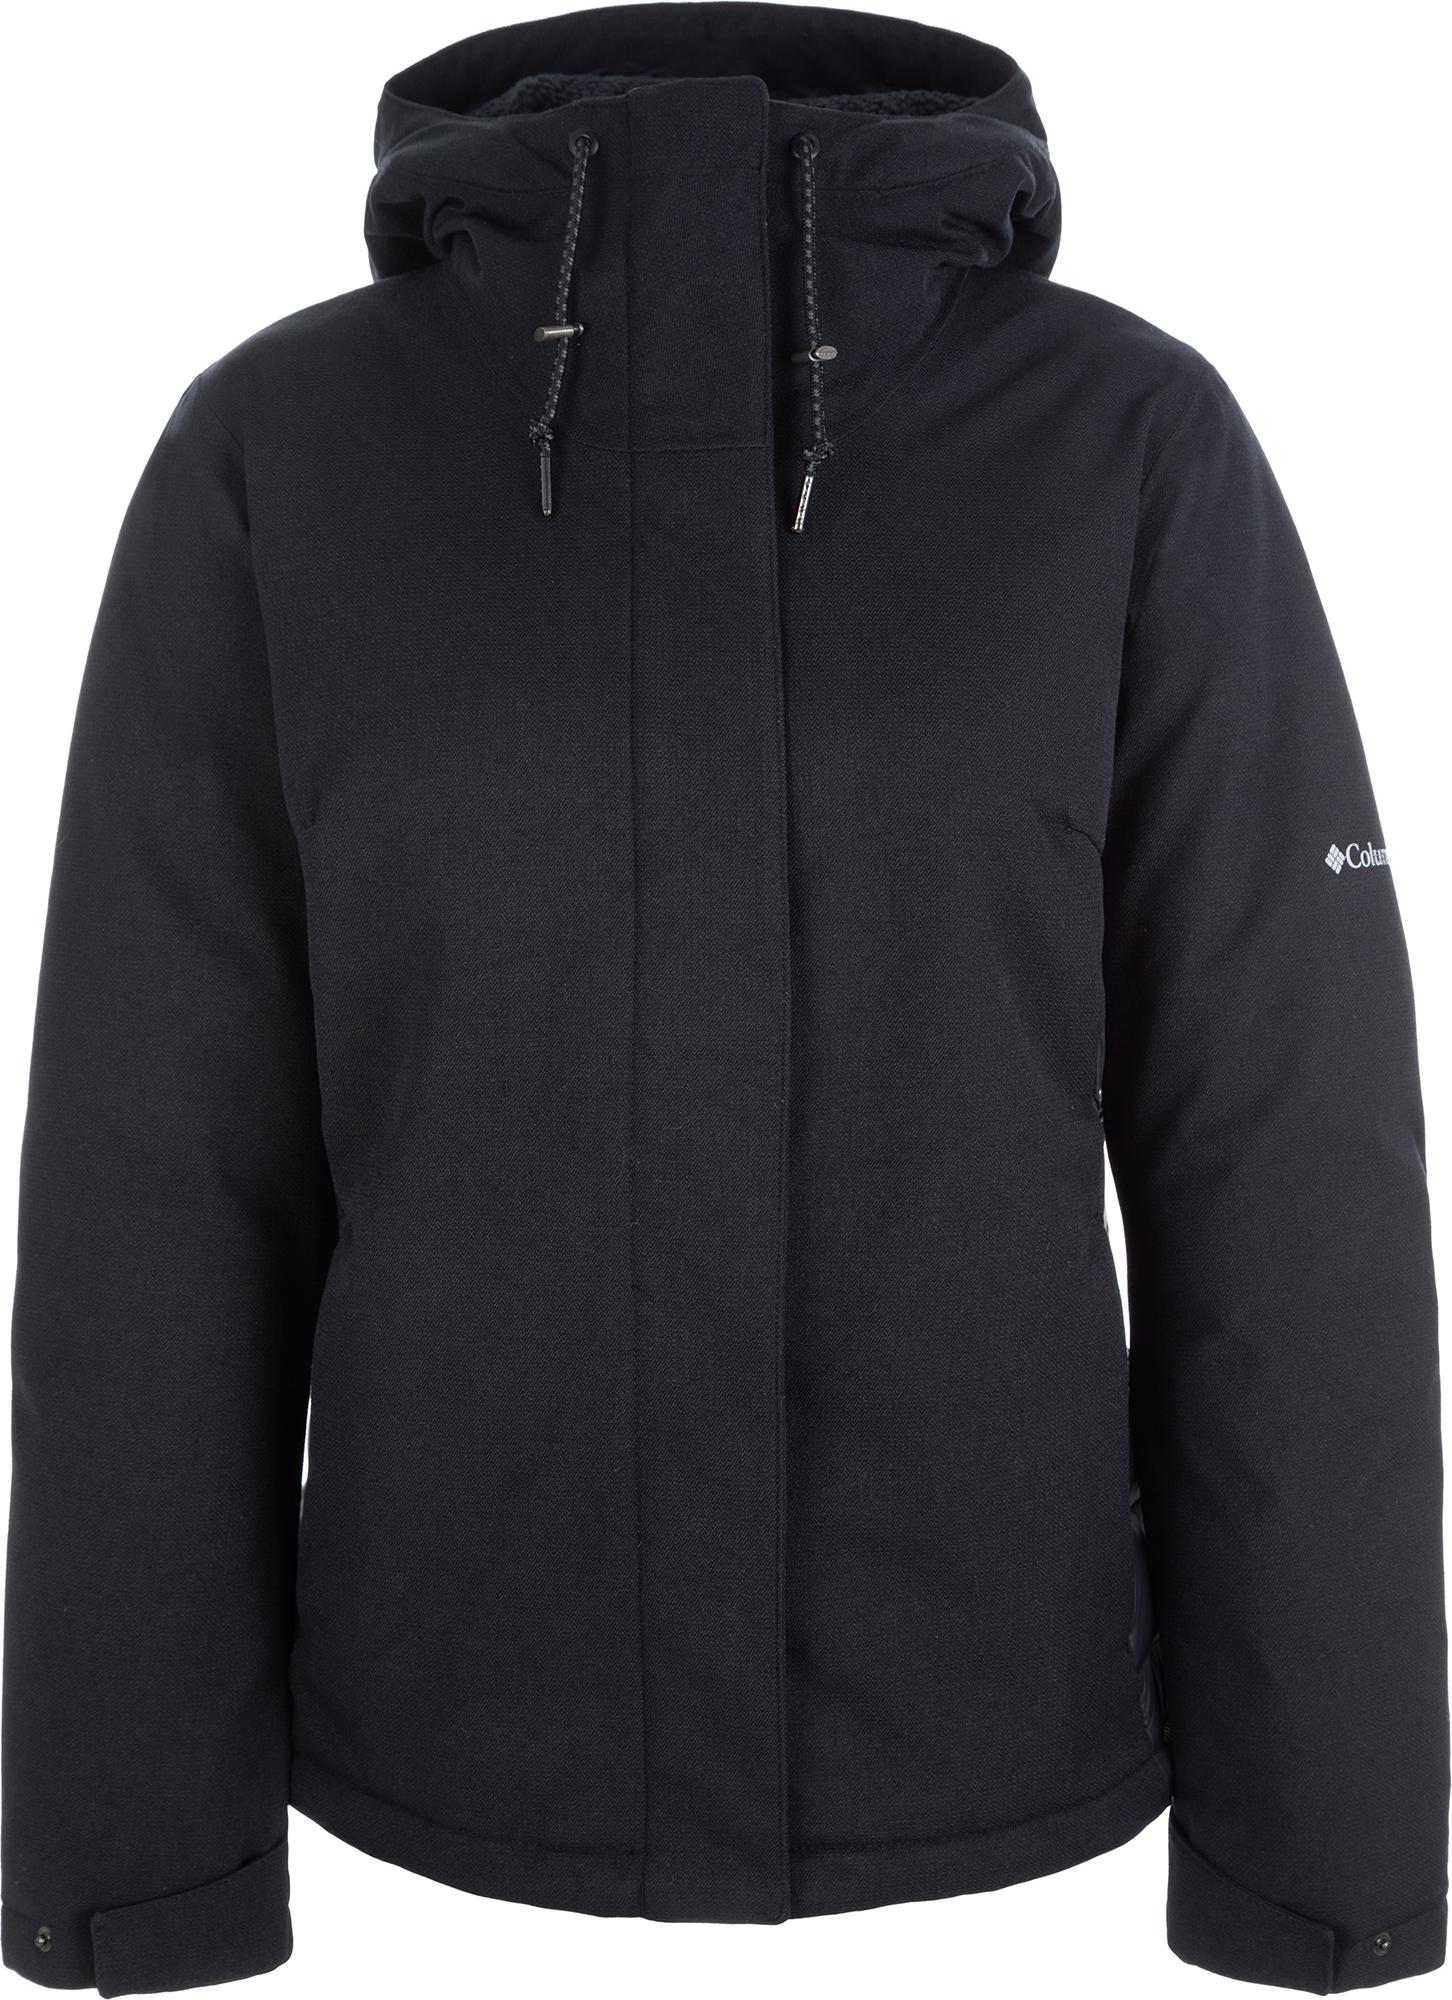 Columbia Куртка утепленная женская Boundary Bay, размер 44